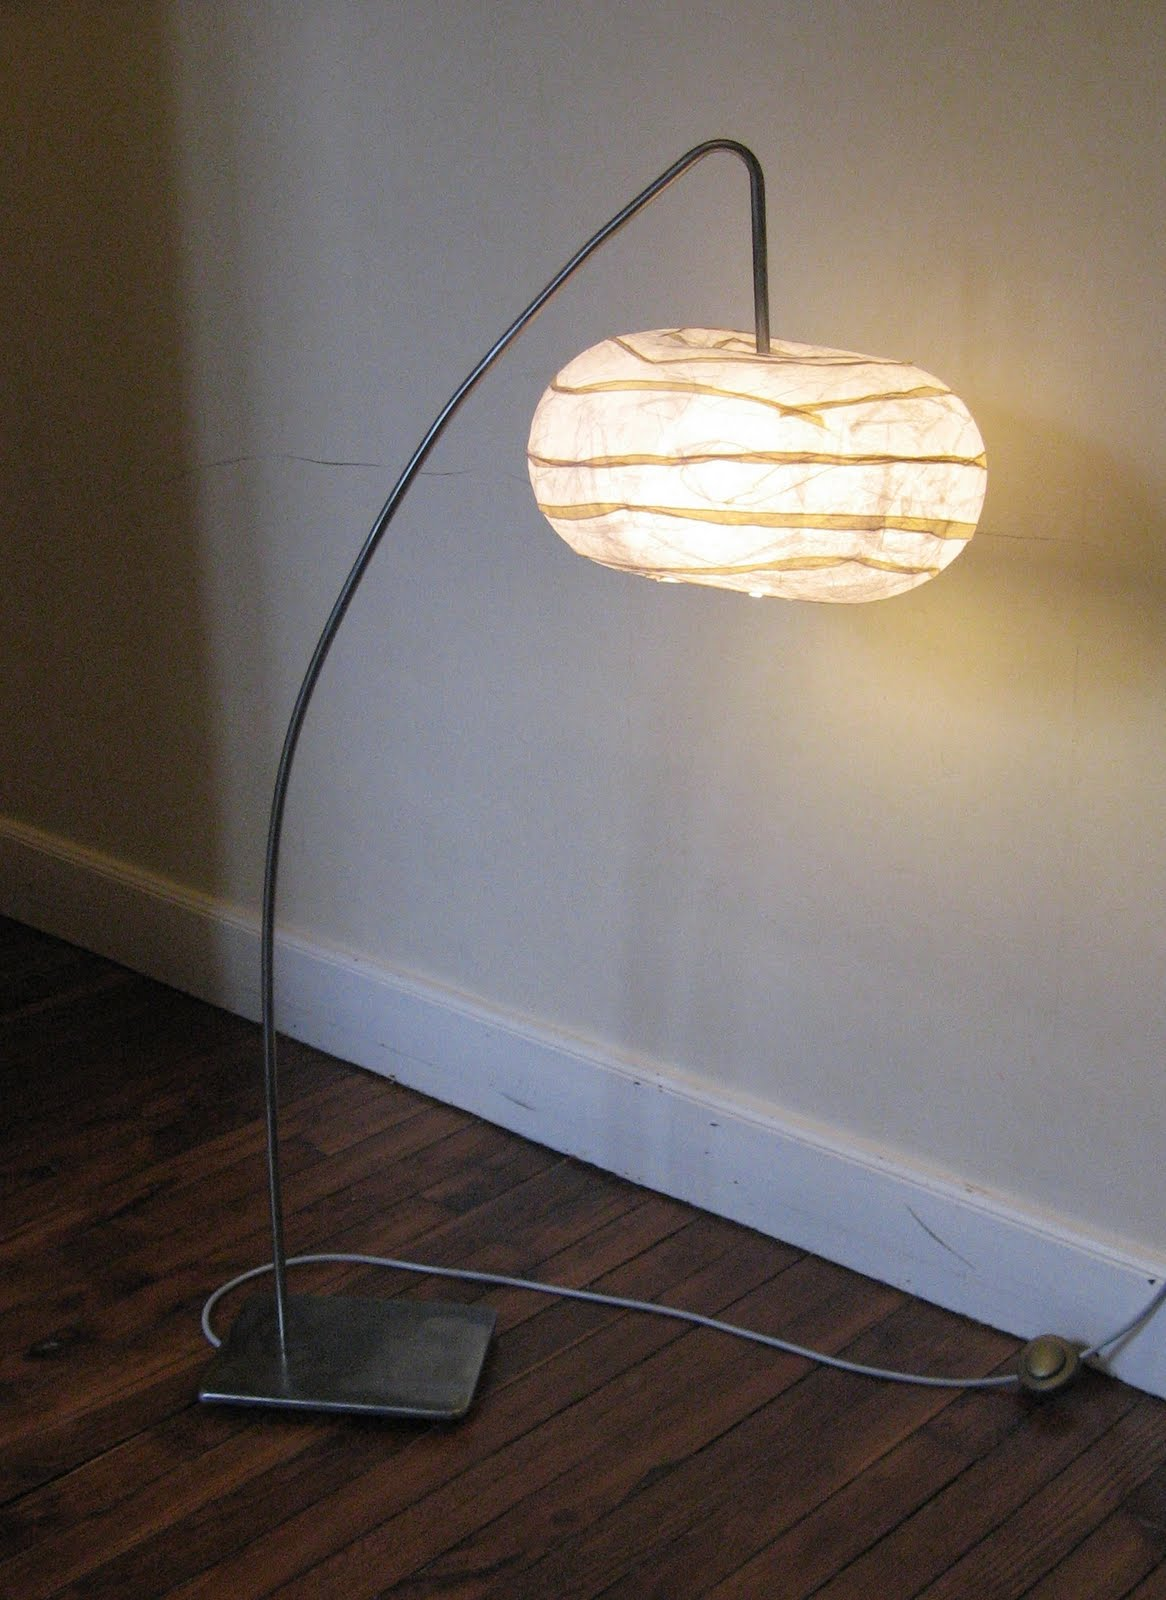 lampadaire fer bross. Black Bedroom Furniture Sets. Home Design Ideas